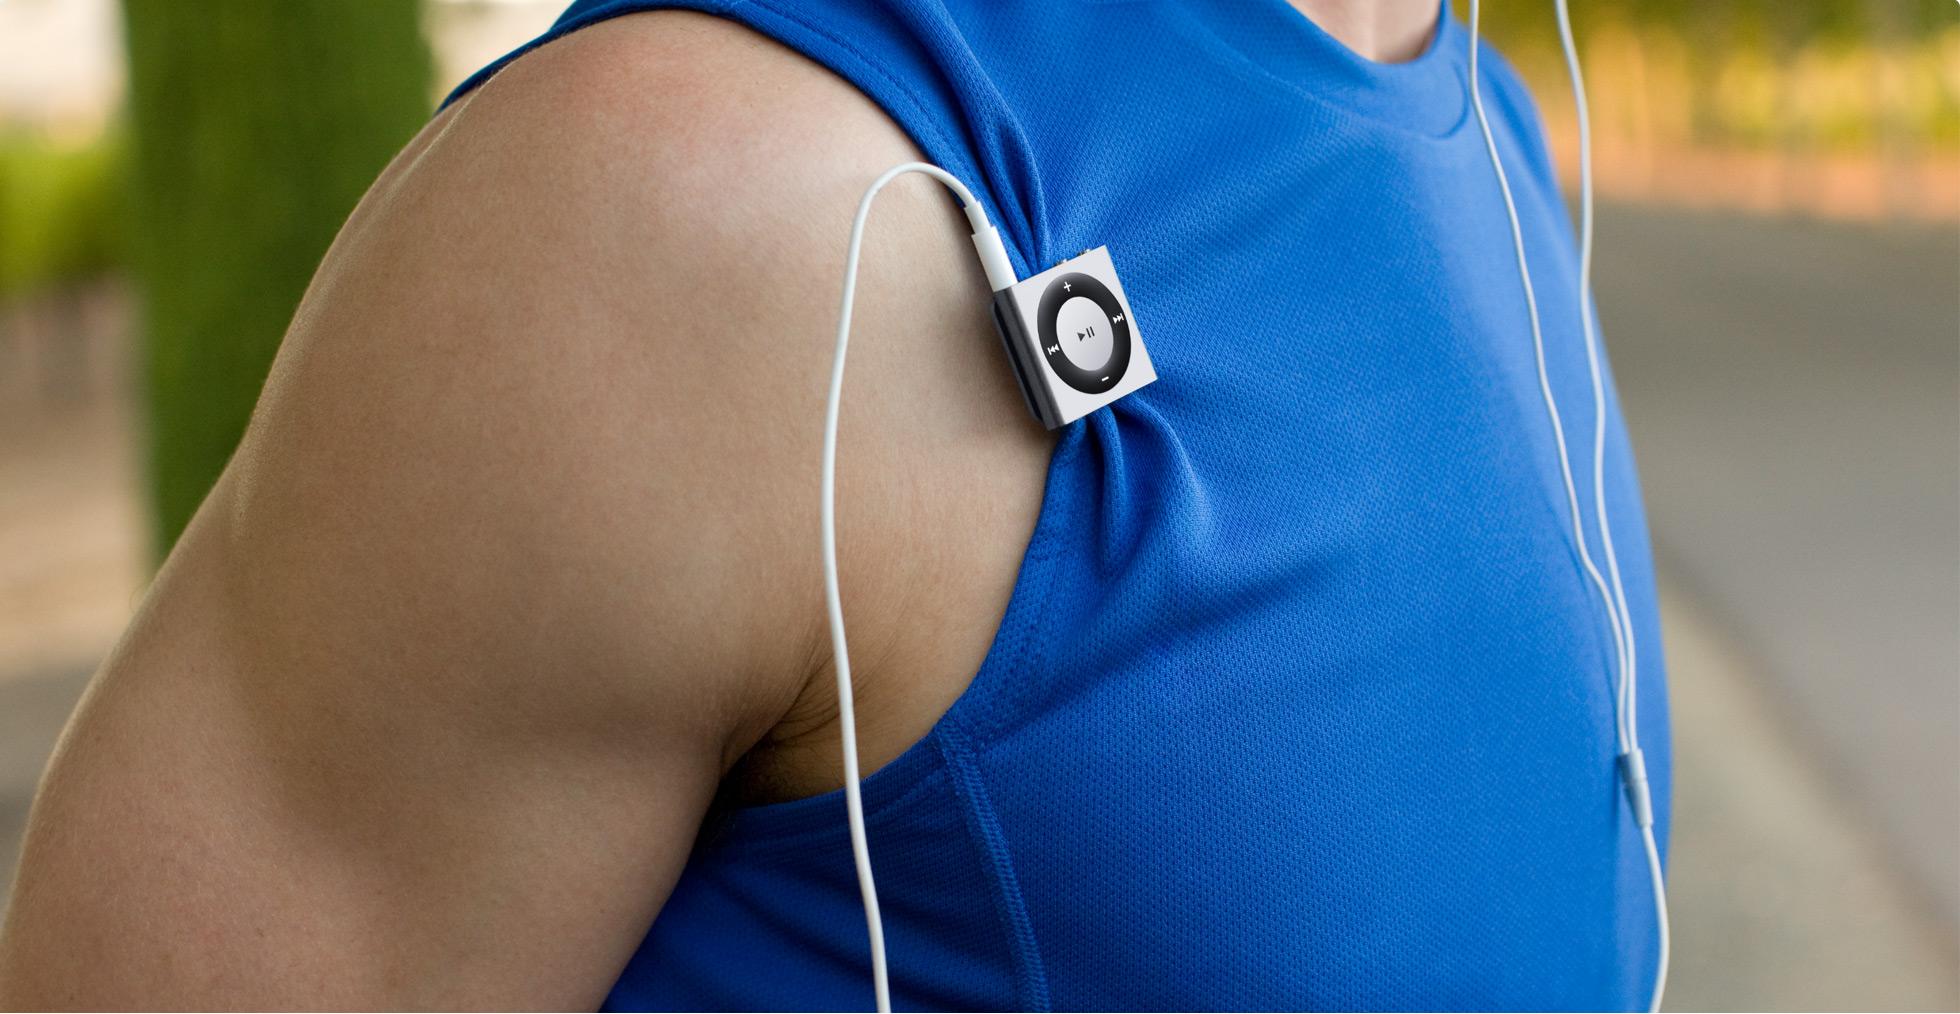 iPod shuffle lifestyle 001